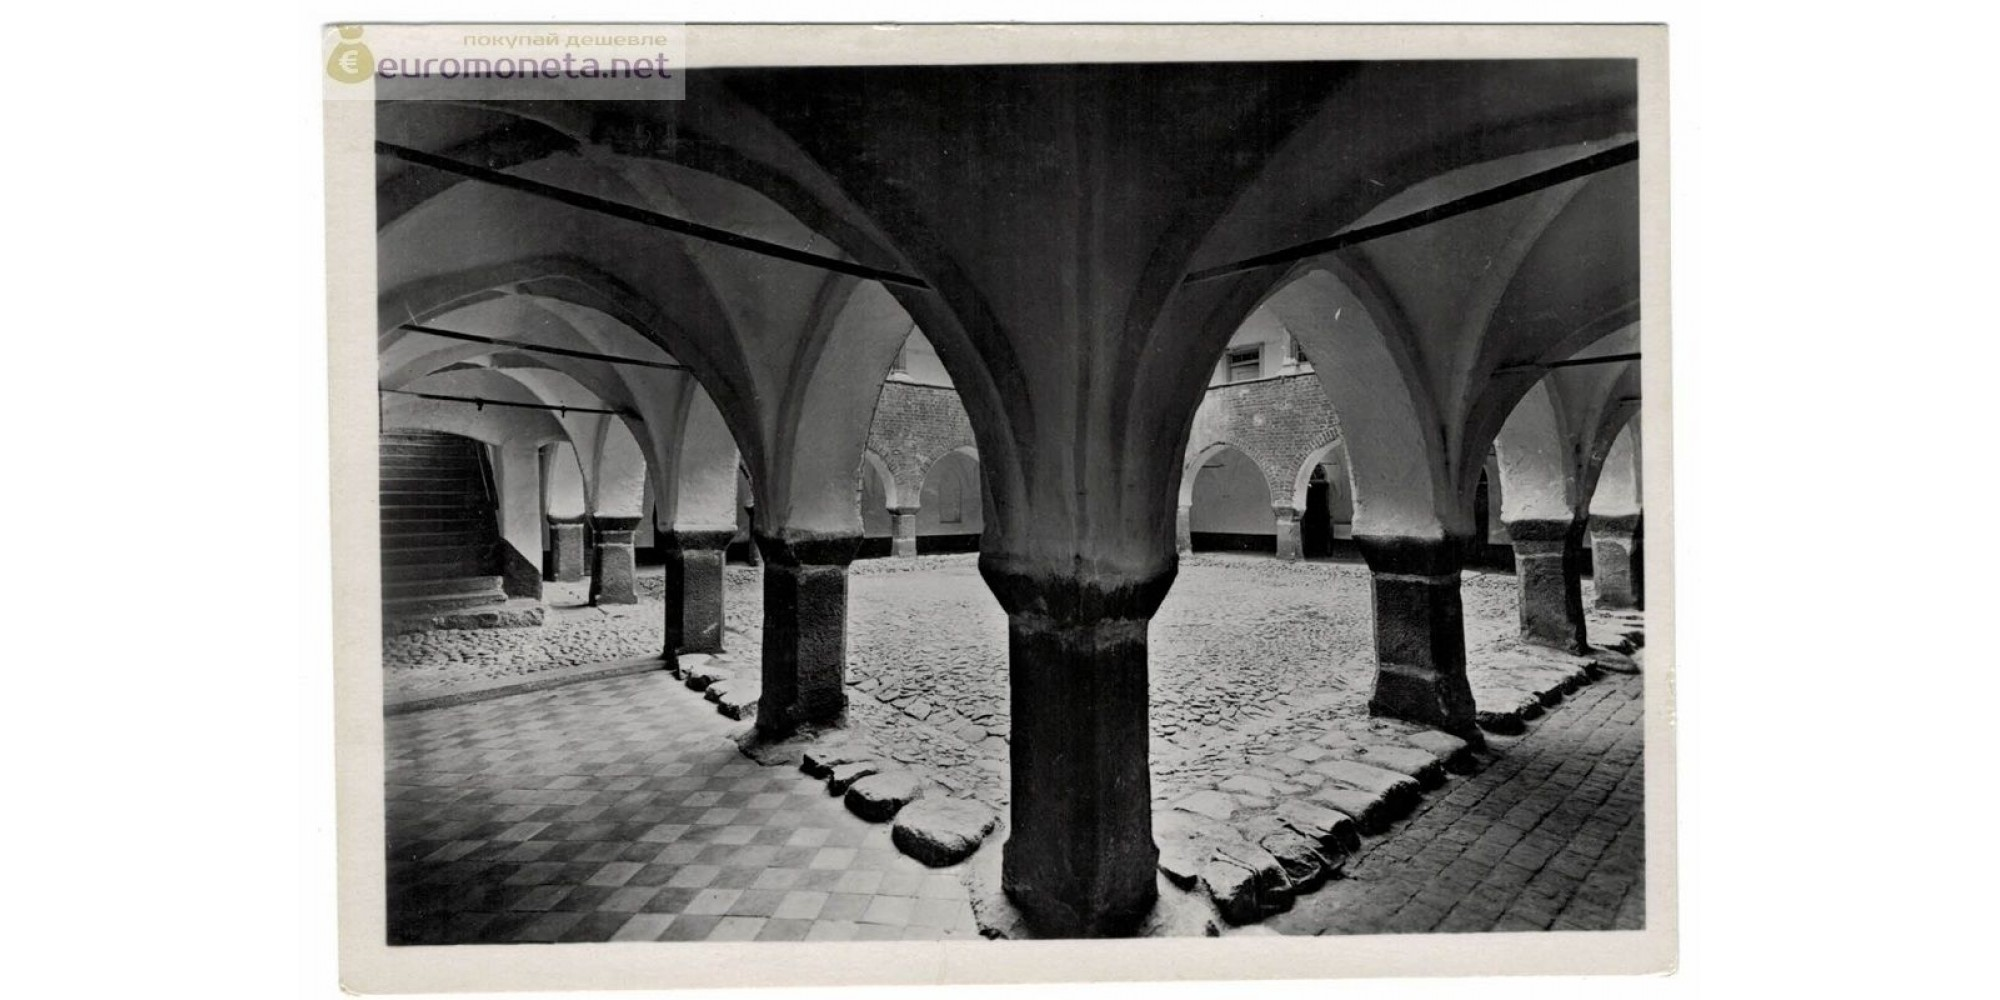 Открытка Пруссия Кёнигсберг Kenigsberg Калининград Королевский замок дворик